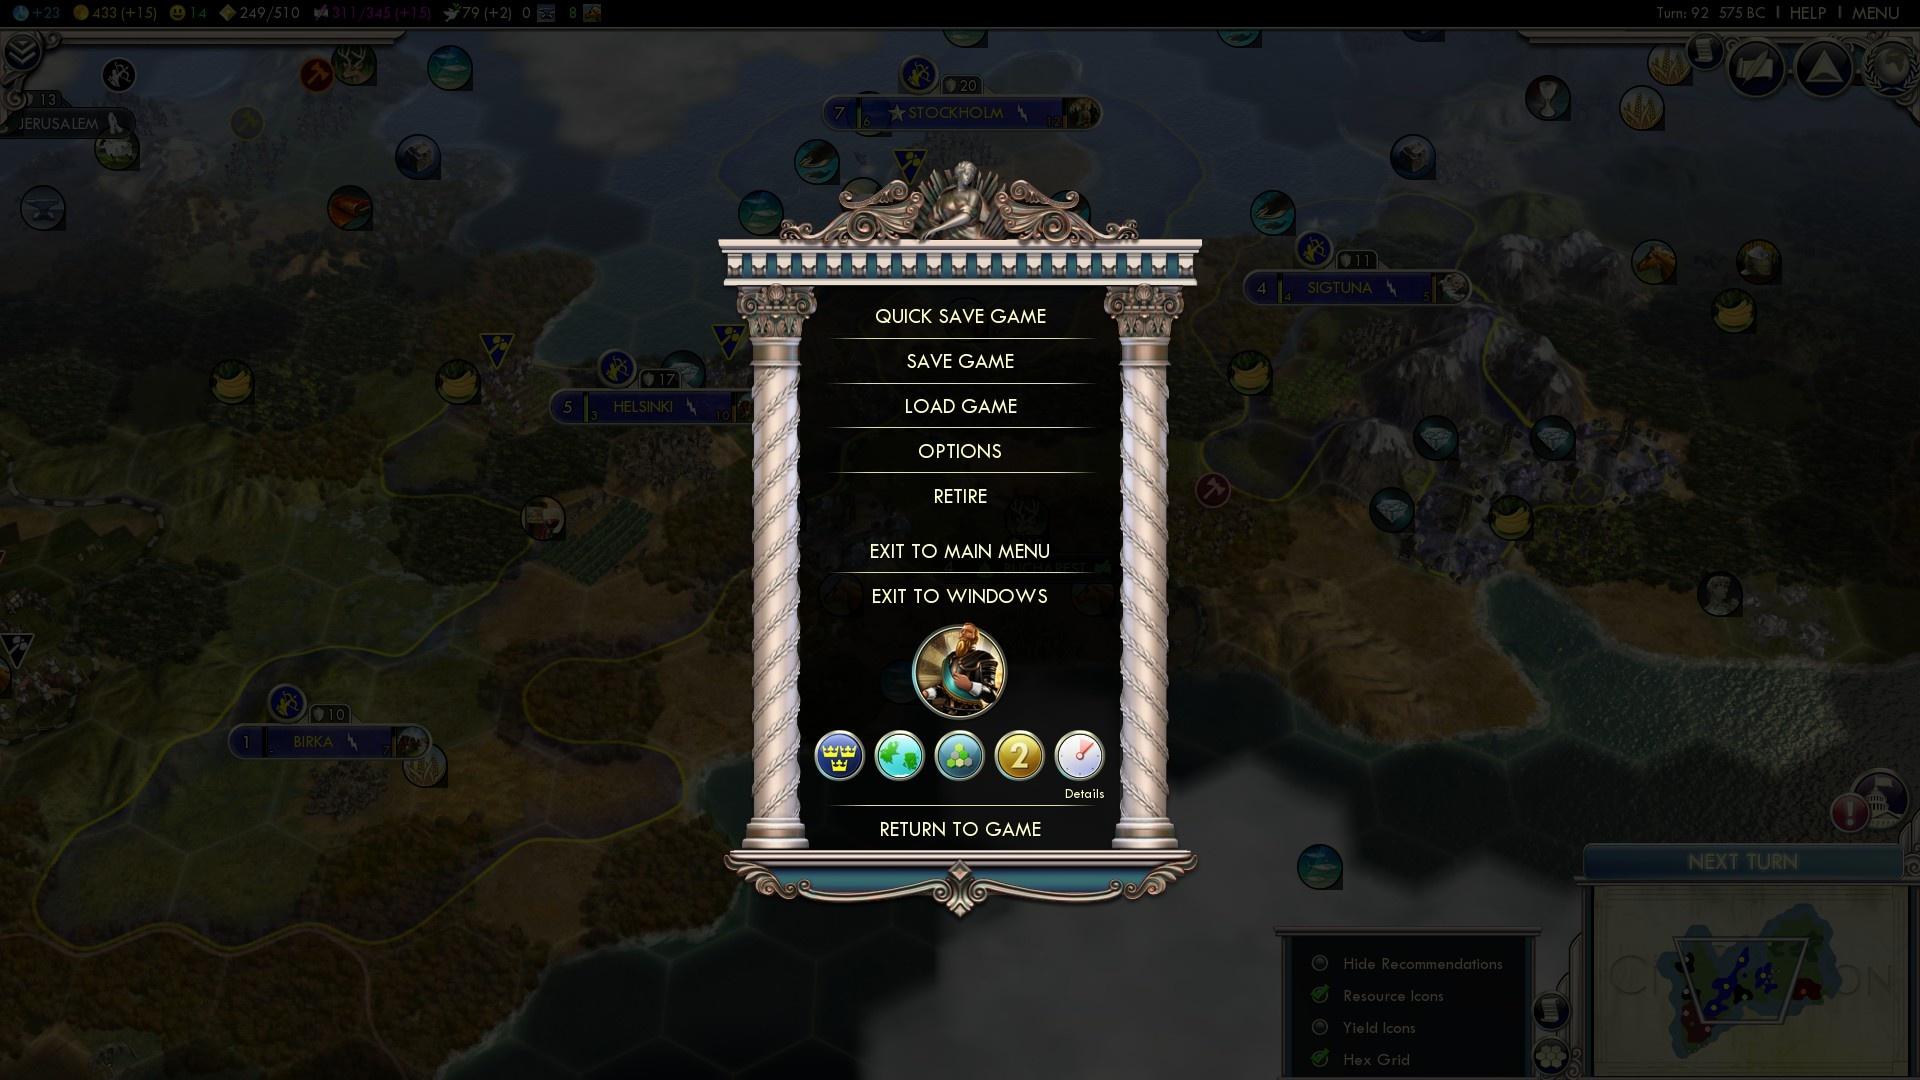 Gamergate spel p1